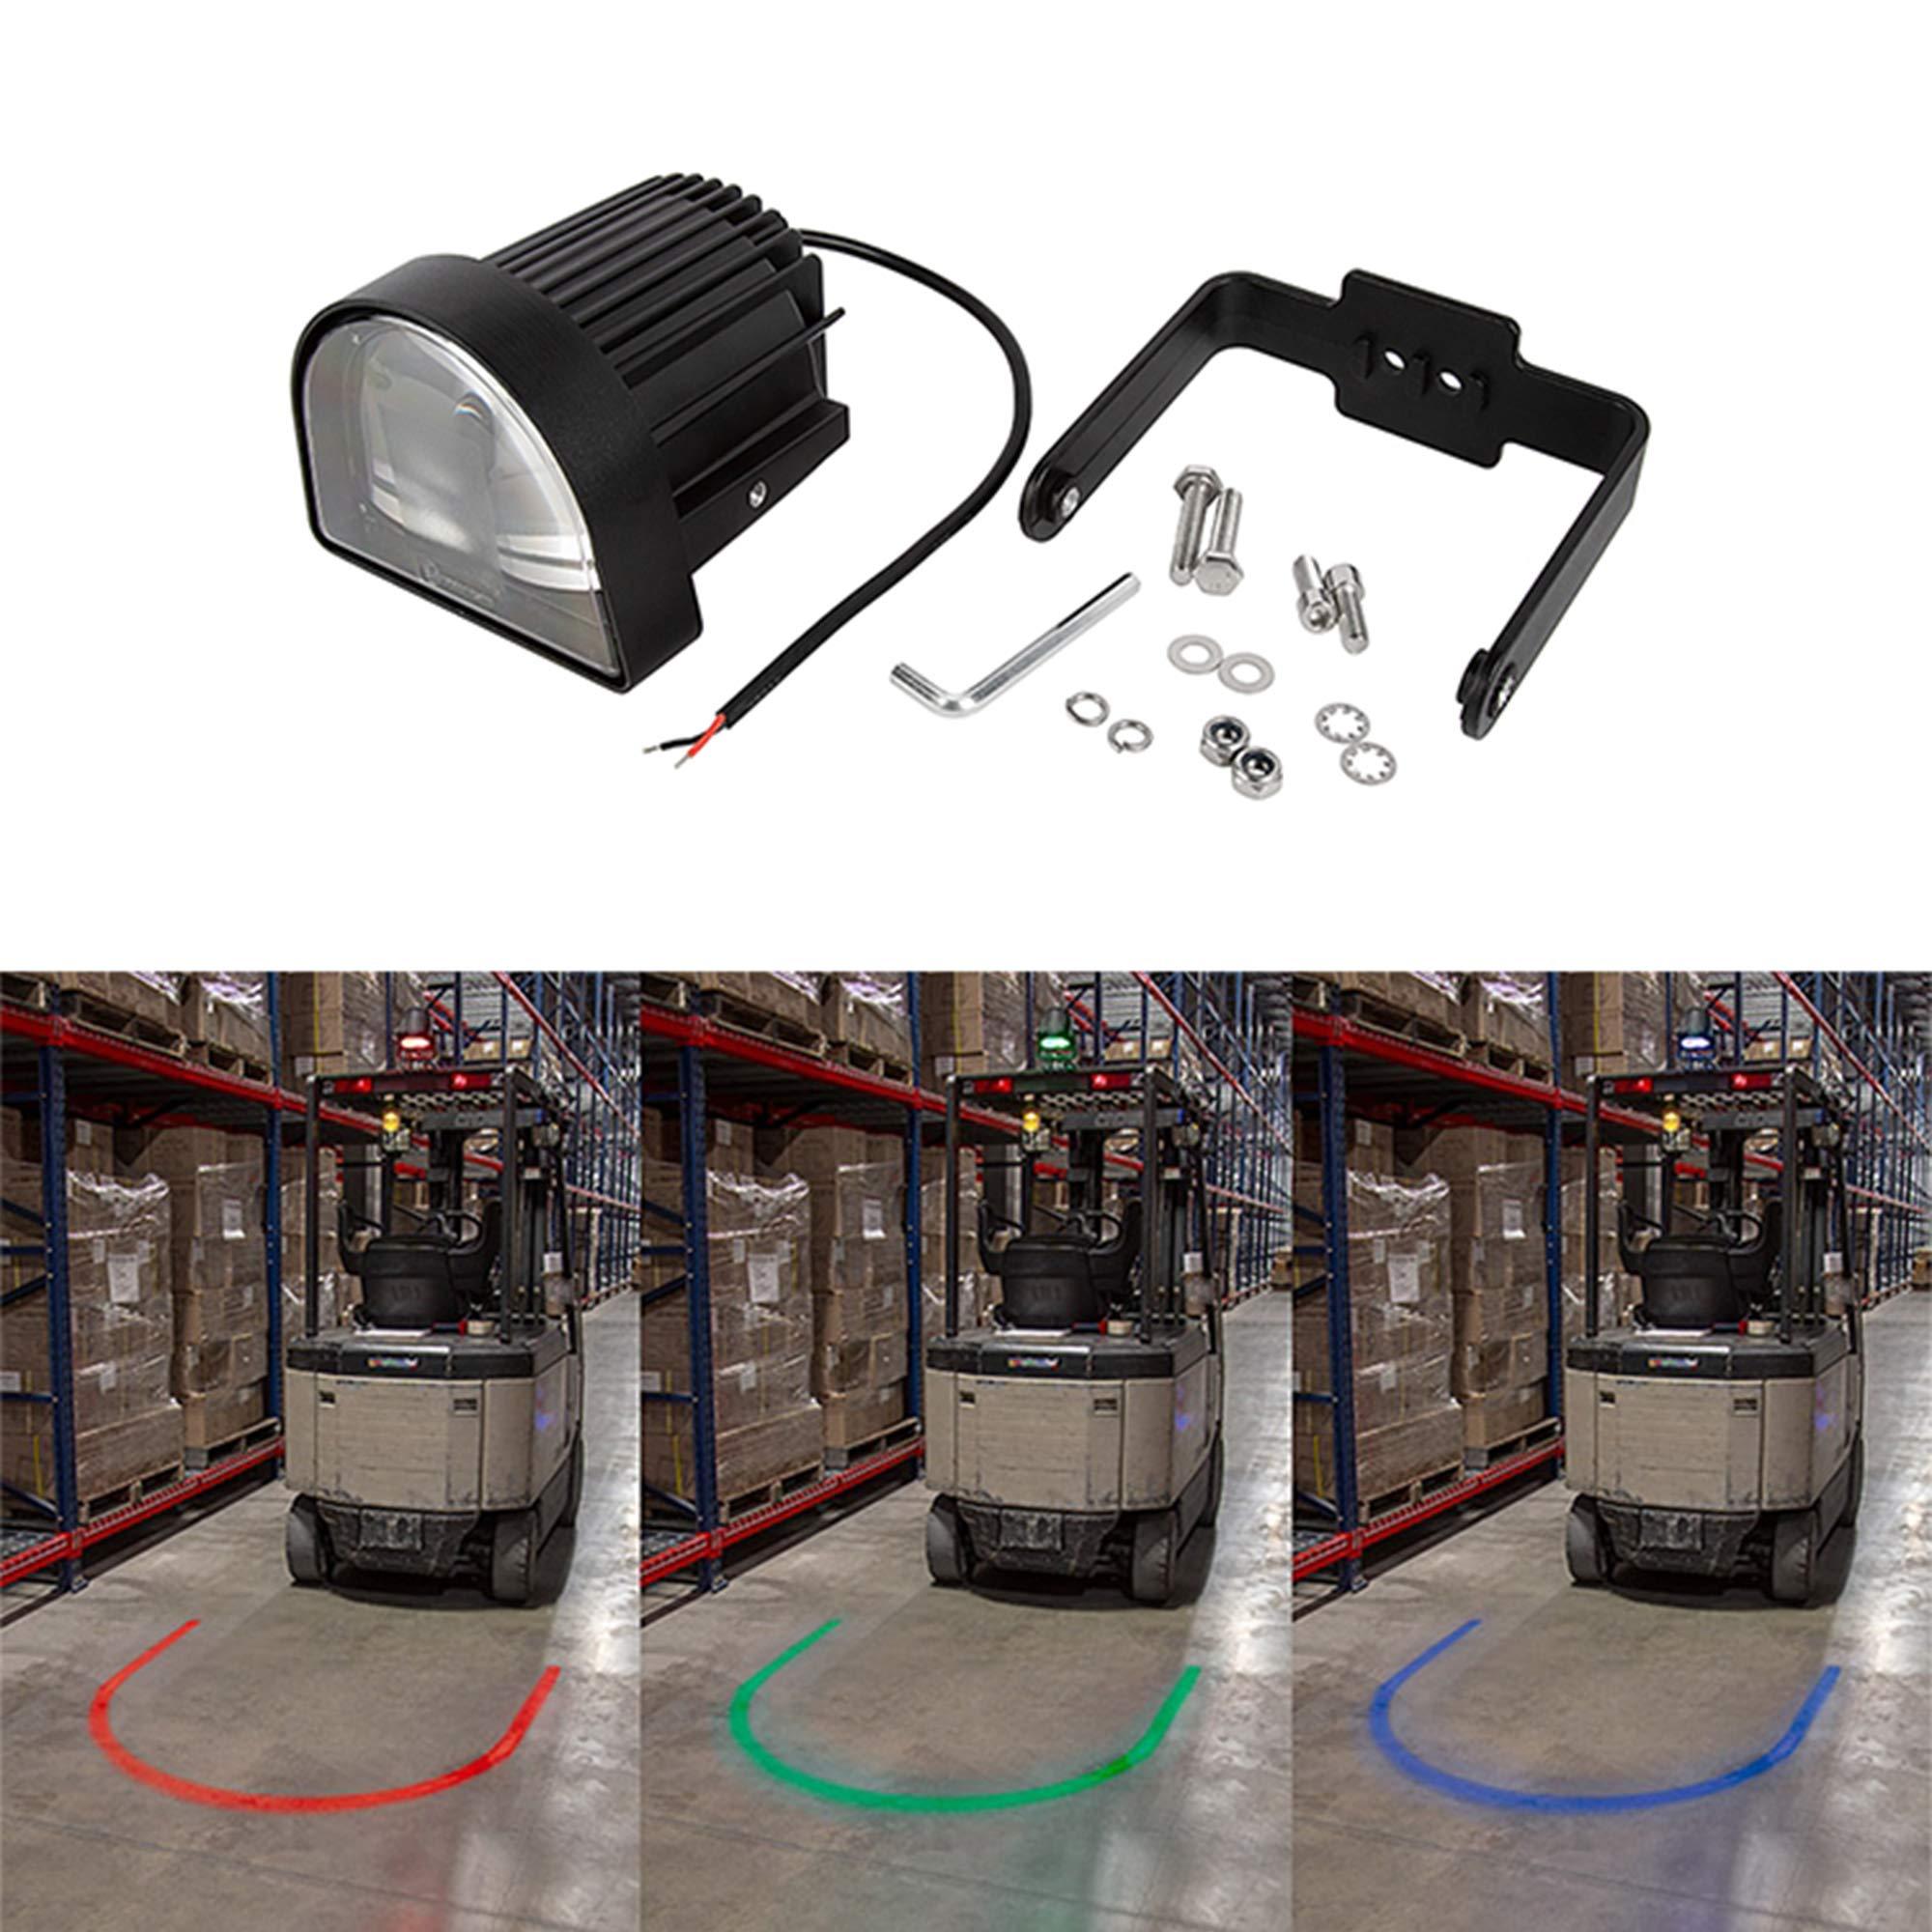 XRLL LED Forklift Safety Warning Light Arc Beam Pattern,Warehouse Reversing Blue Spot Warning Light,U Beam Forklift Red Zone Danger Area Lights 10-80V (Red) by XRLL